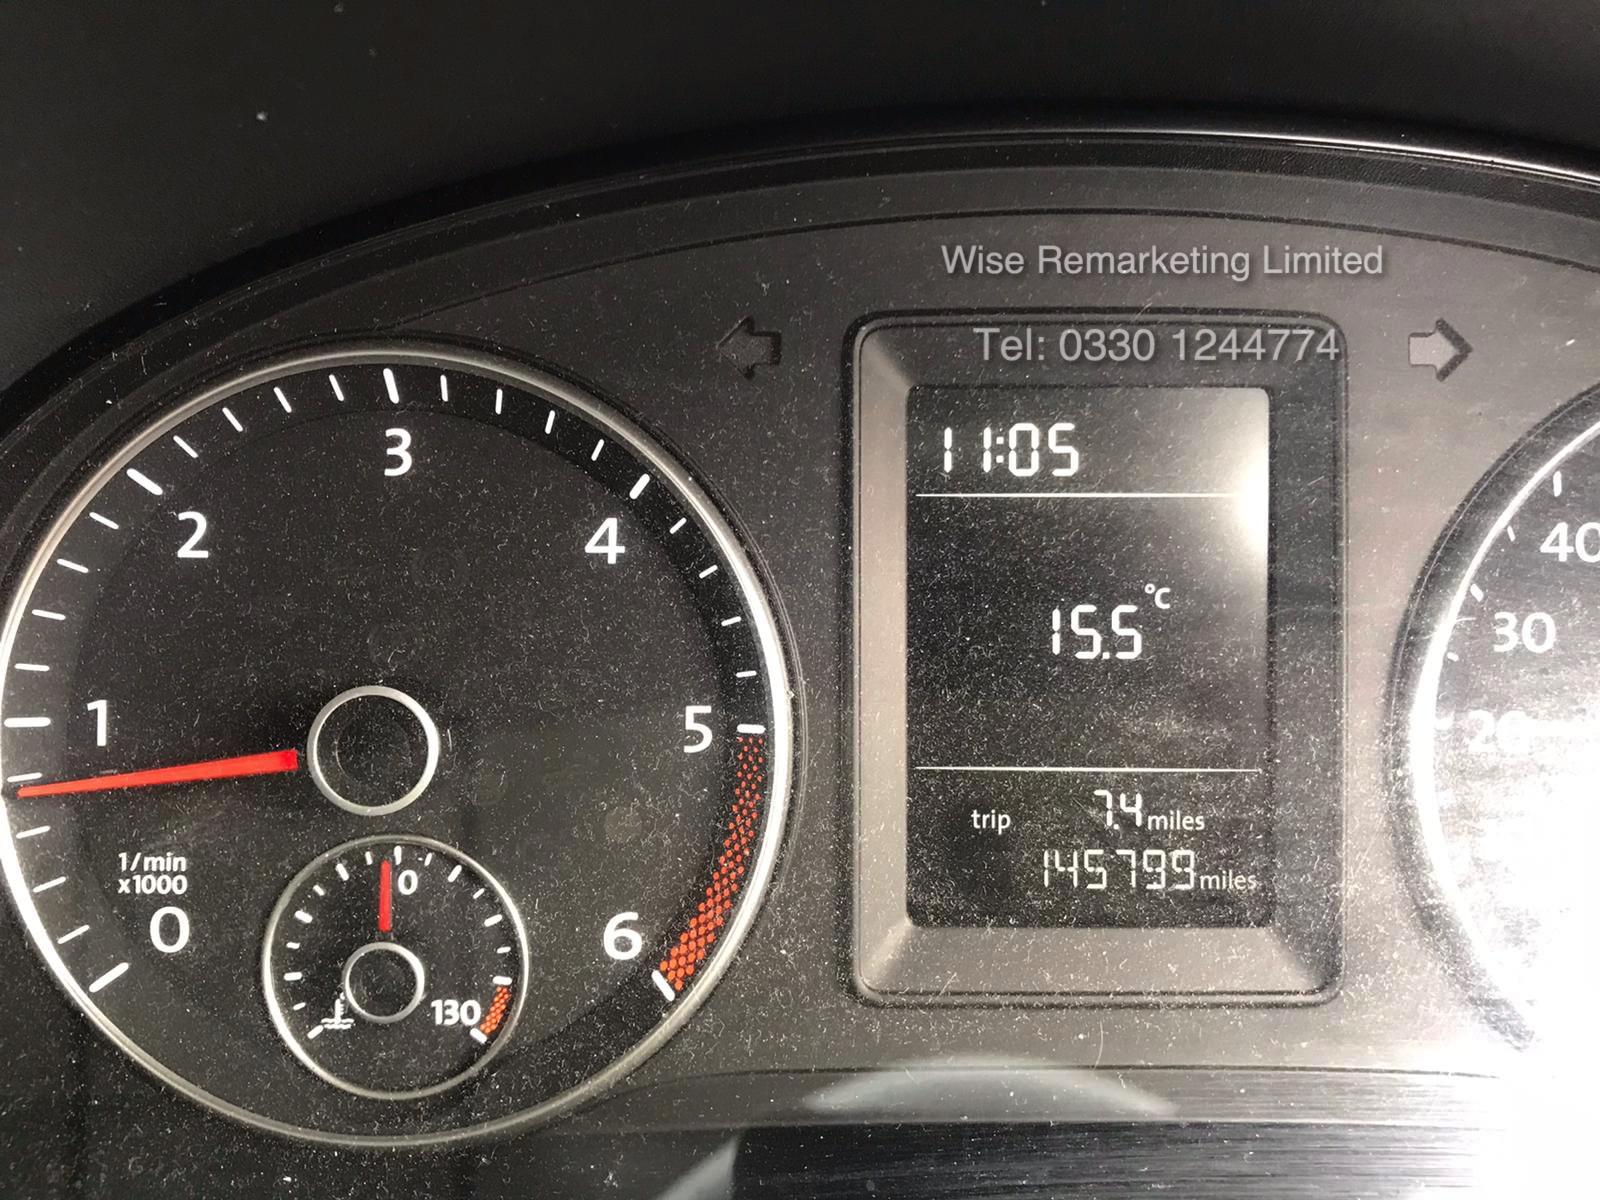 Lot 21 - Volkswagen Caddy C20 + Startline 1.6 Tdi - 2014 Model - White - Side Loading Door - Ply Lined